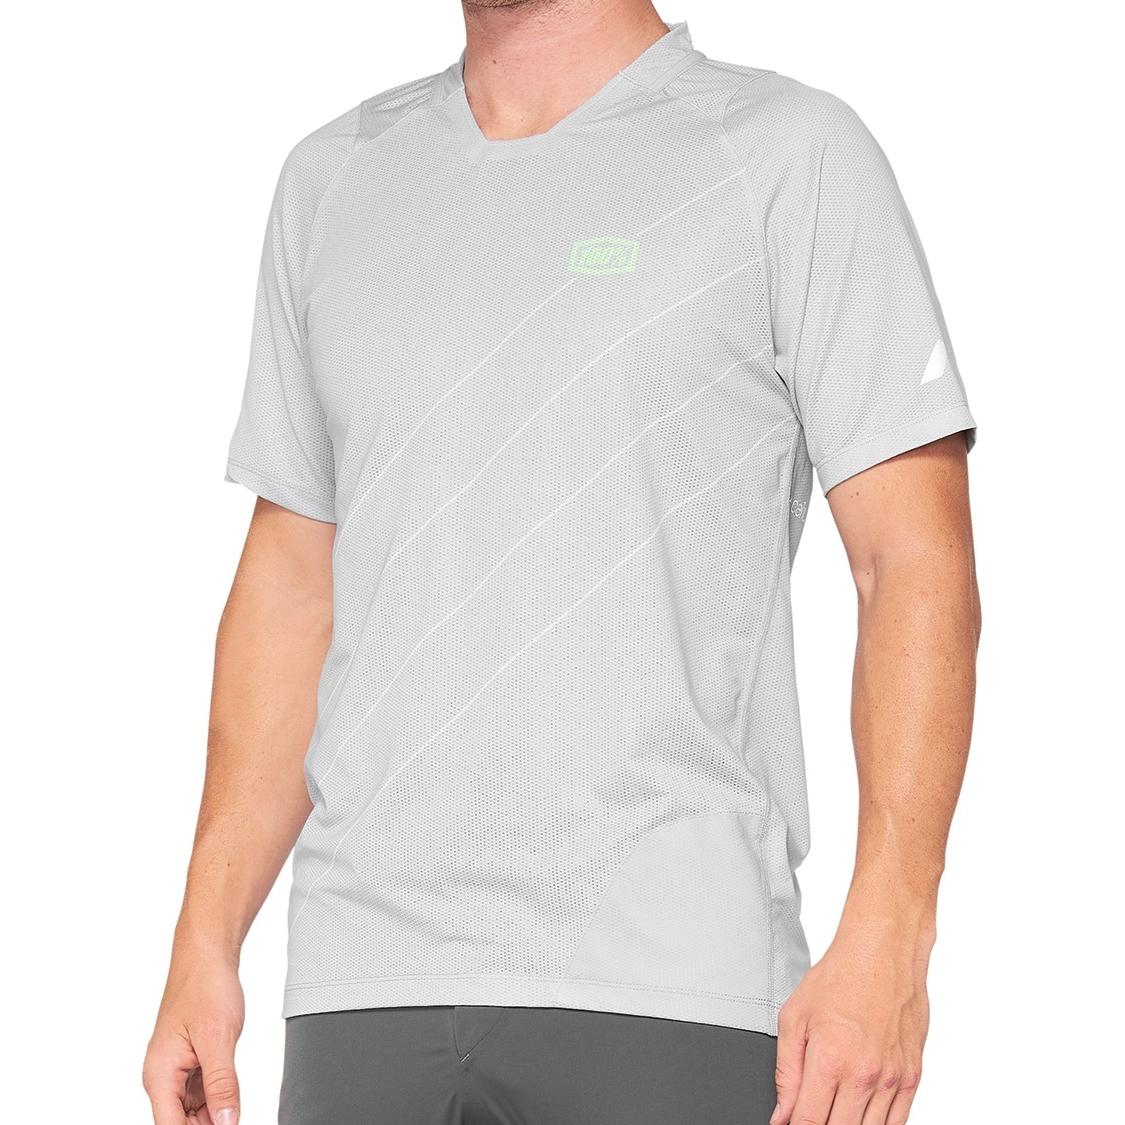 Image of 100% Celium Enduro/Trail Jersey - vapor/lime